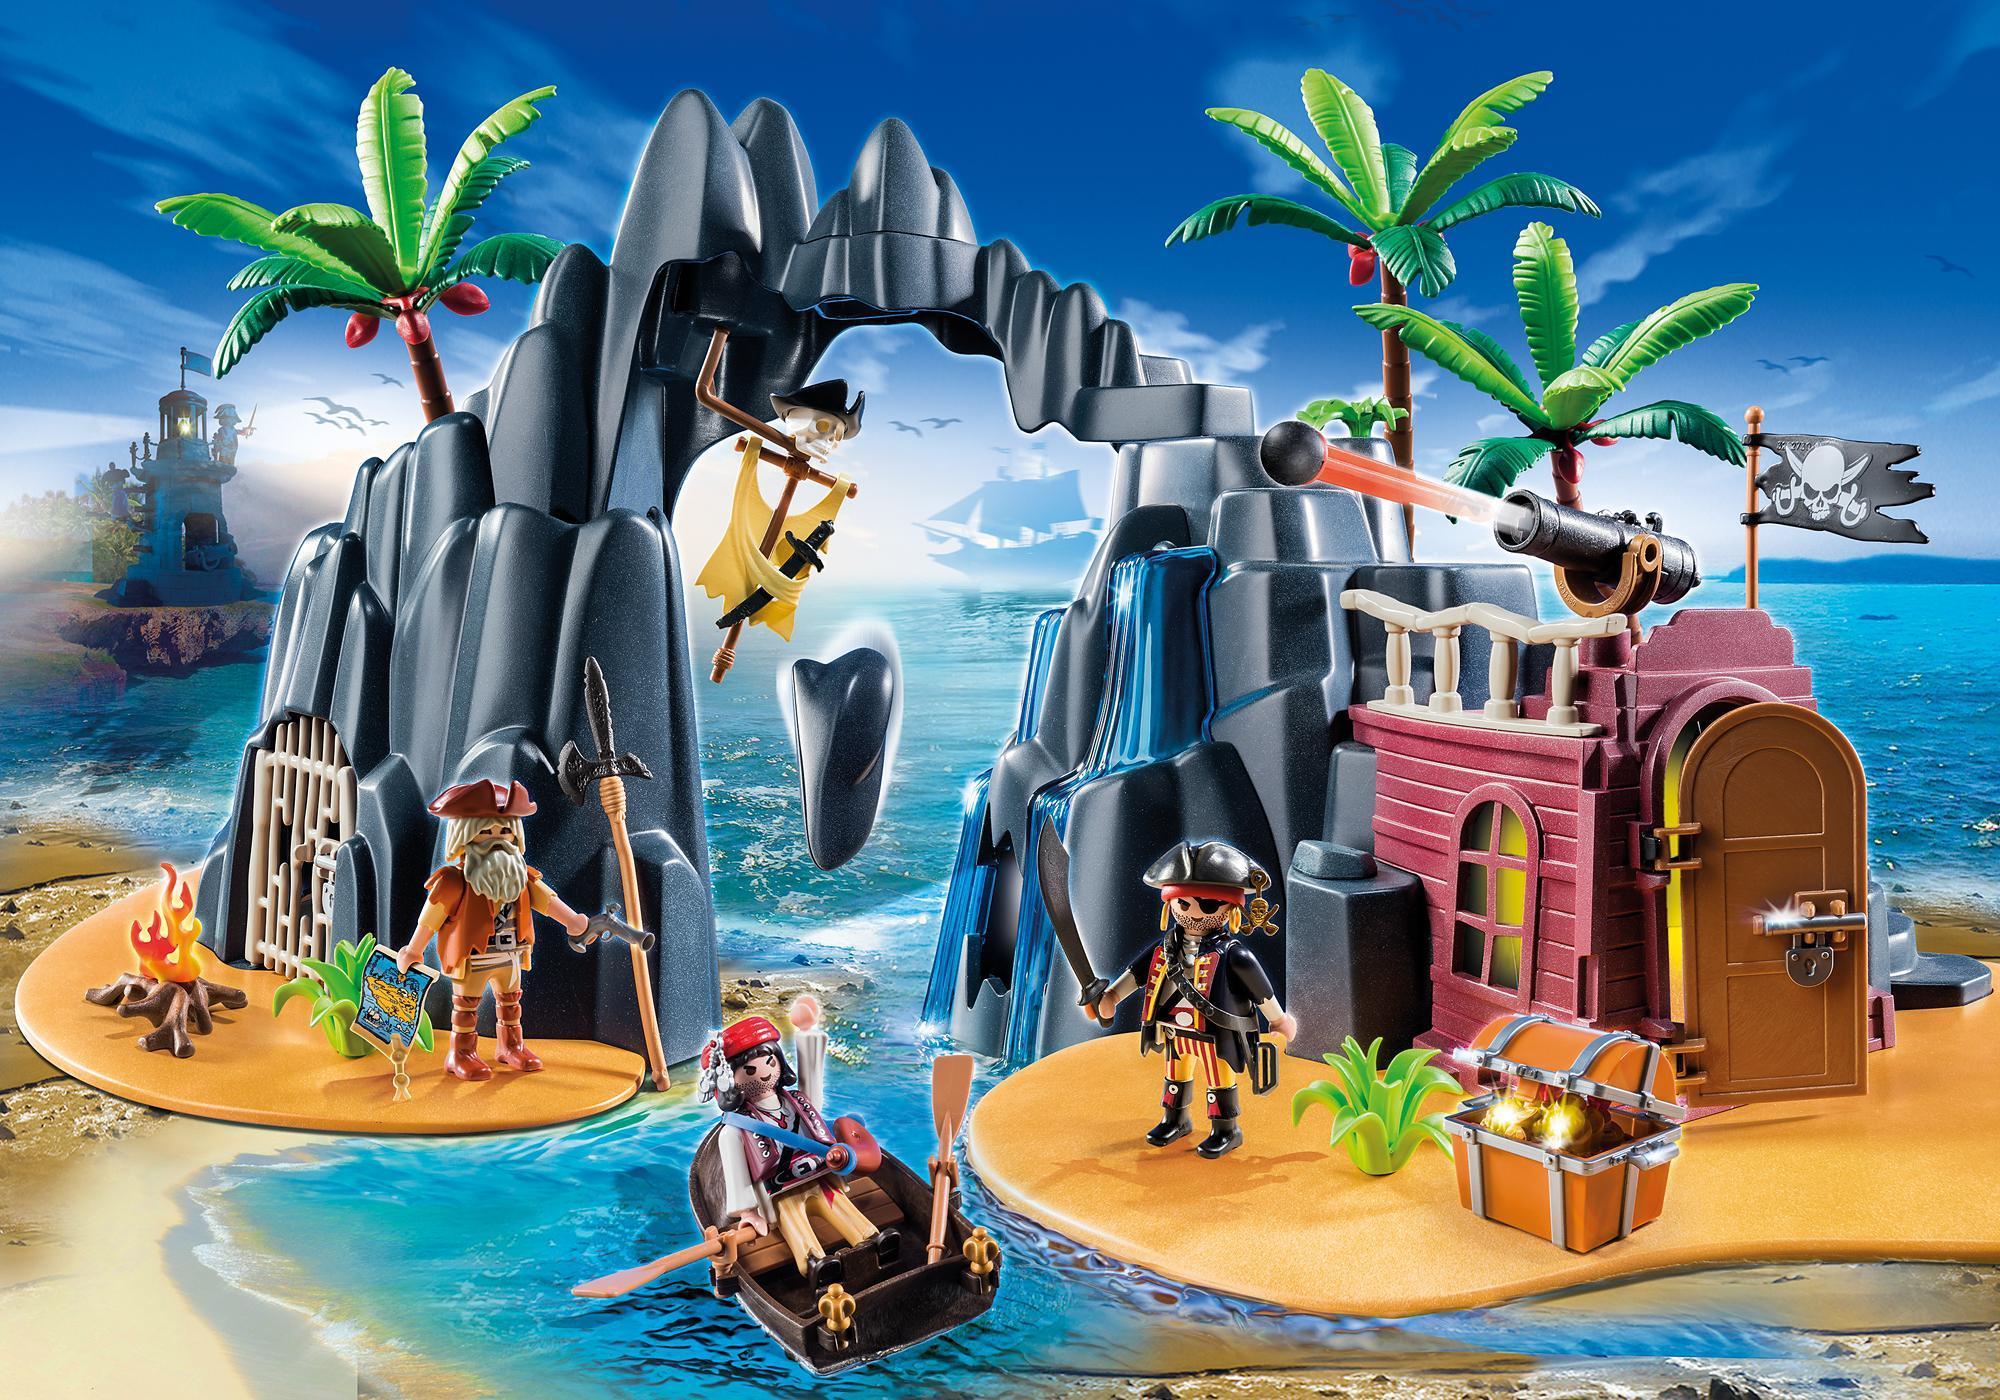 6679_product_detail/Πειρατικό νησί θησαυρού